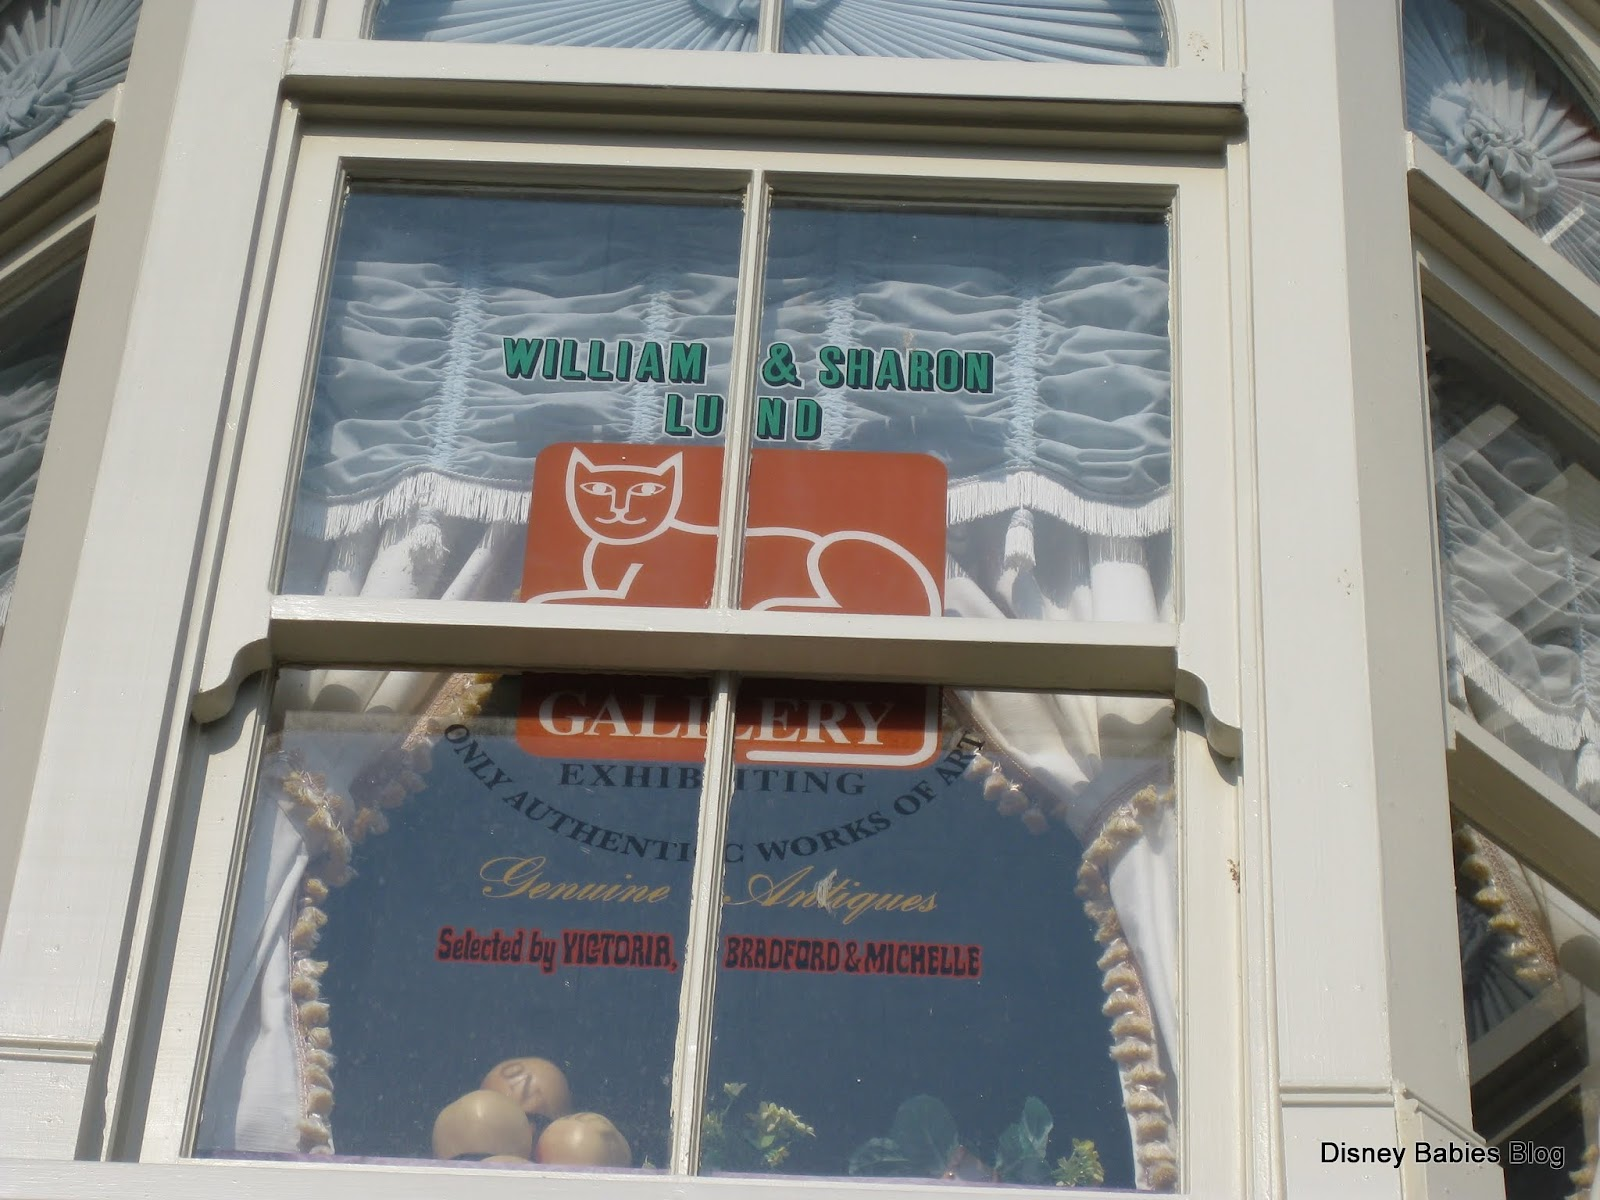 17 disney park windows worth a closer look mental floss